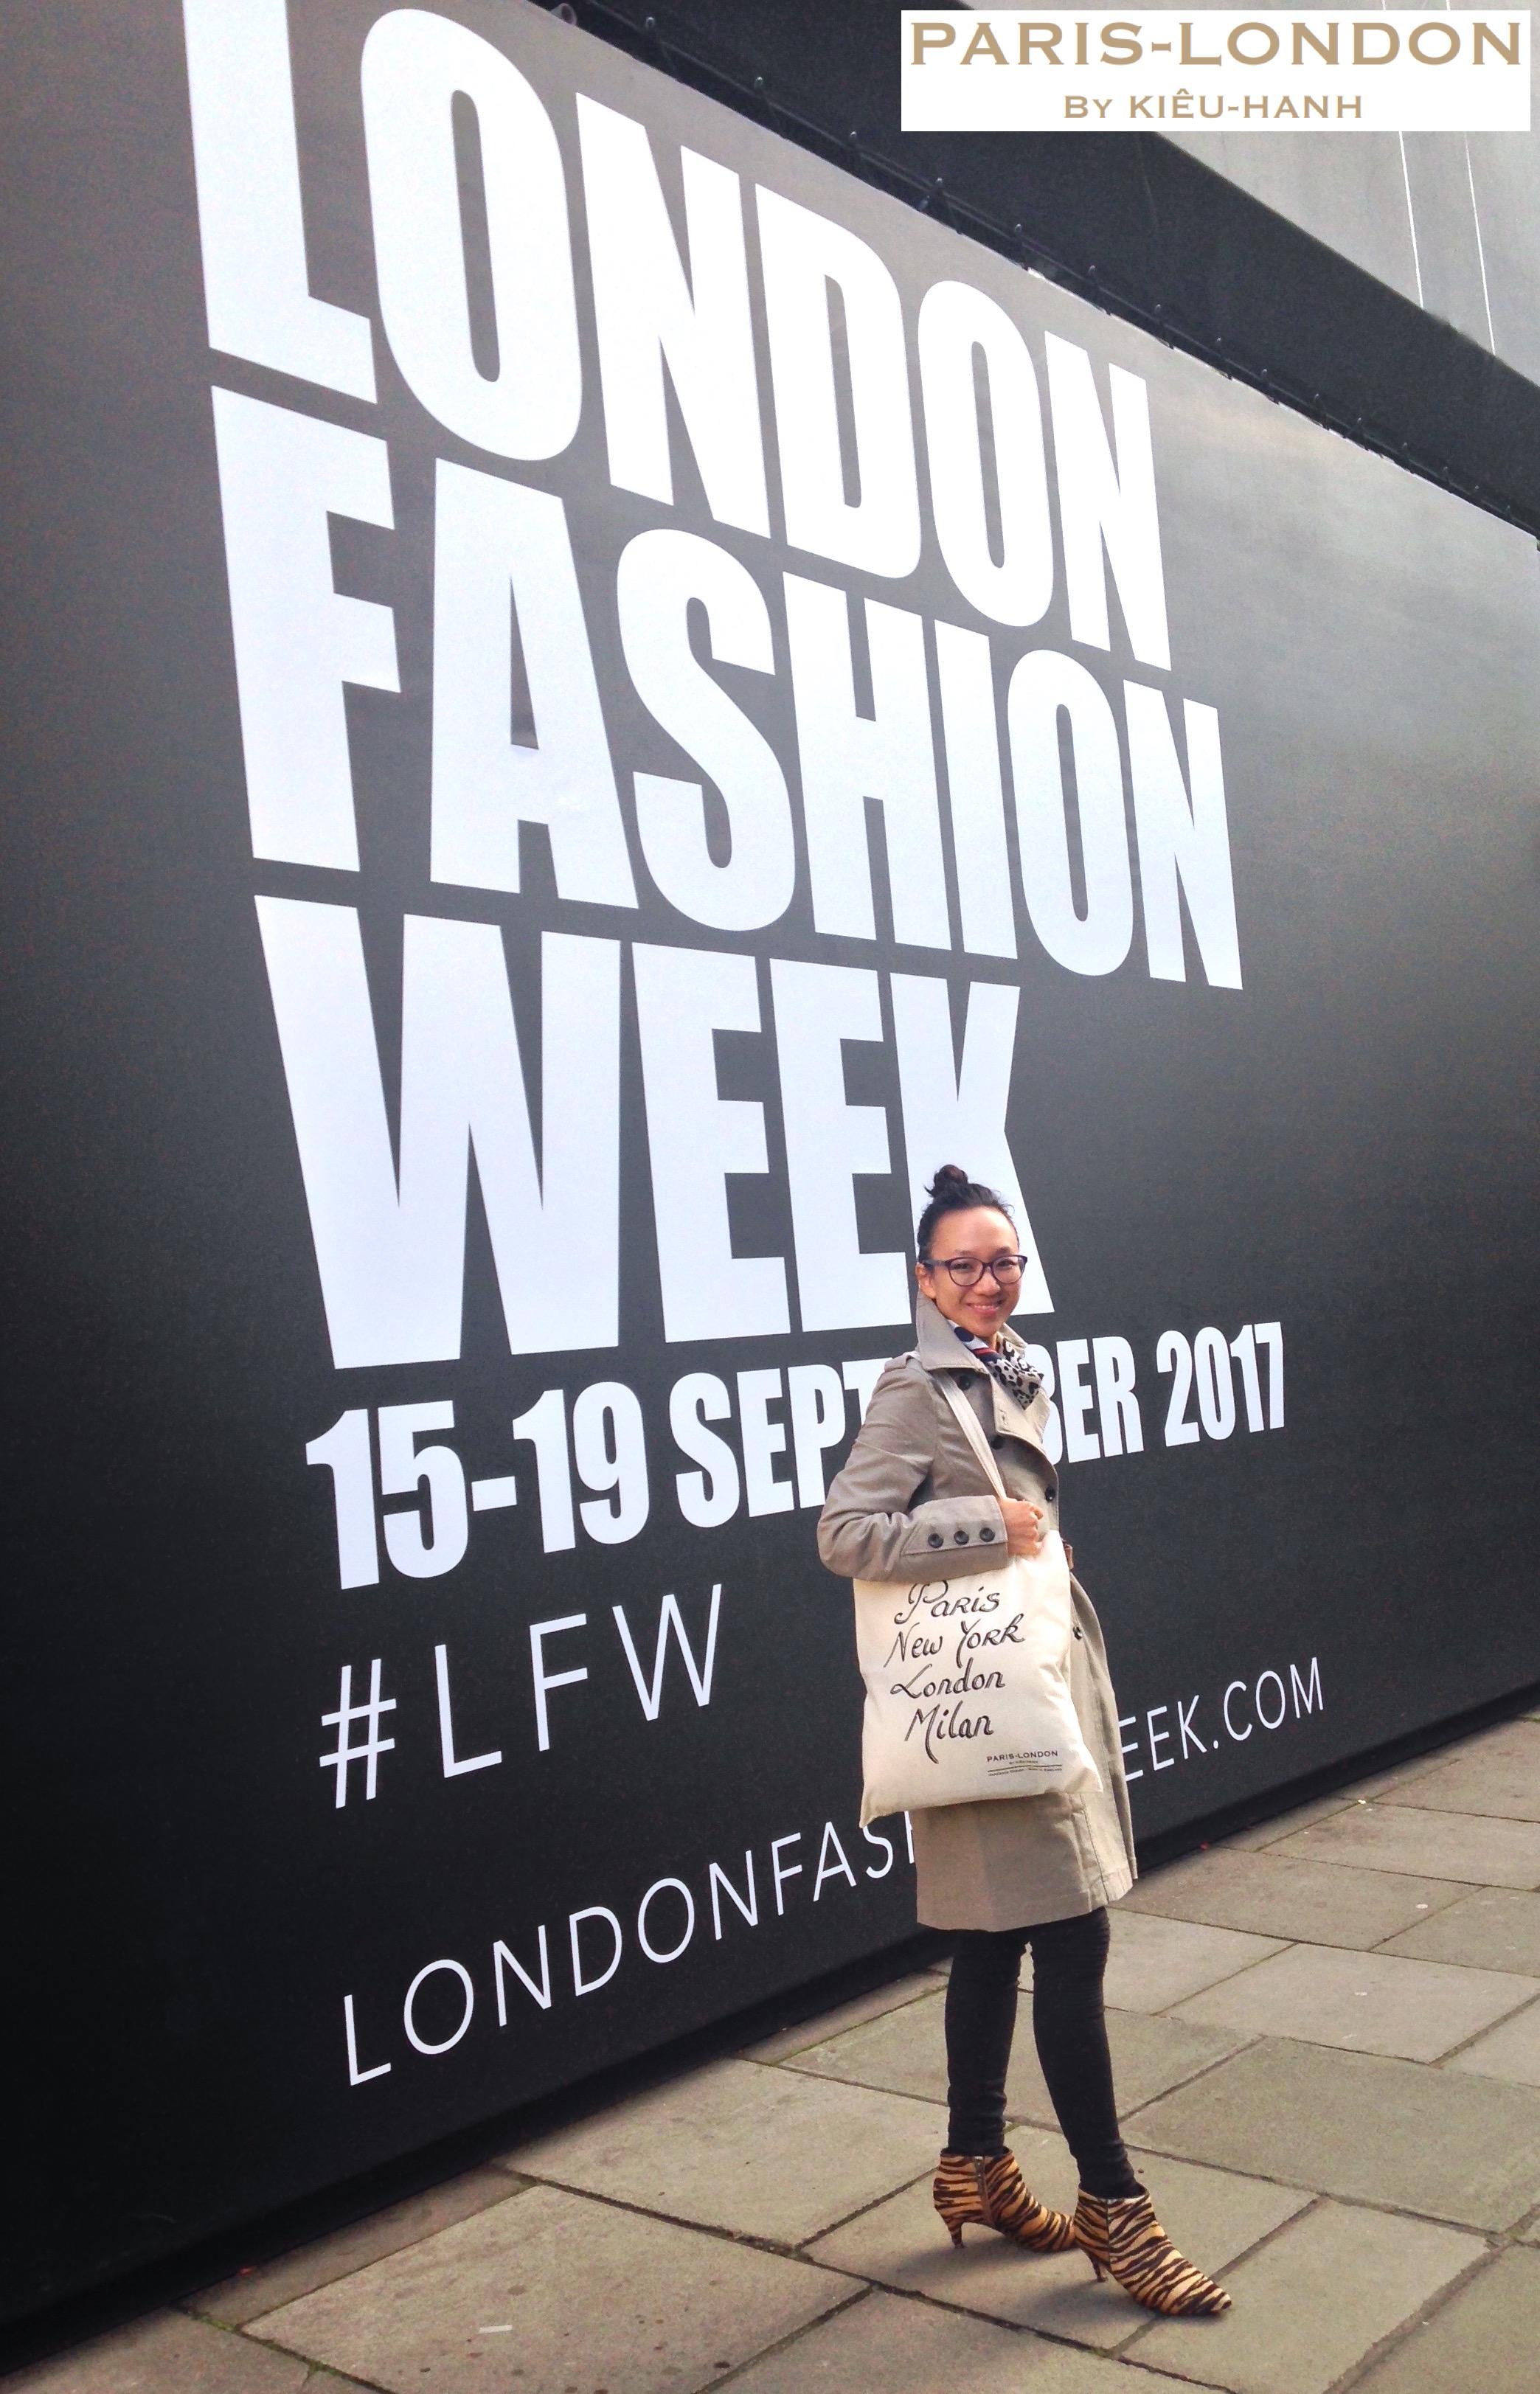 London Fashion Week Paris-London By Kieu-Hanh (2).jpg